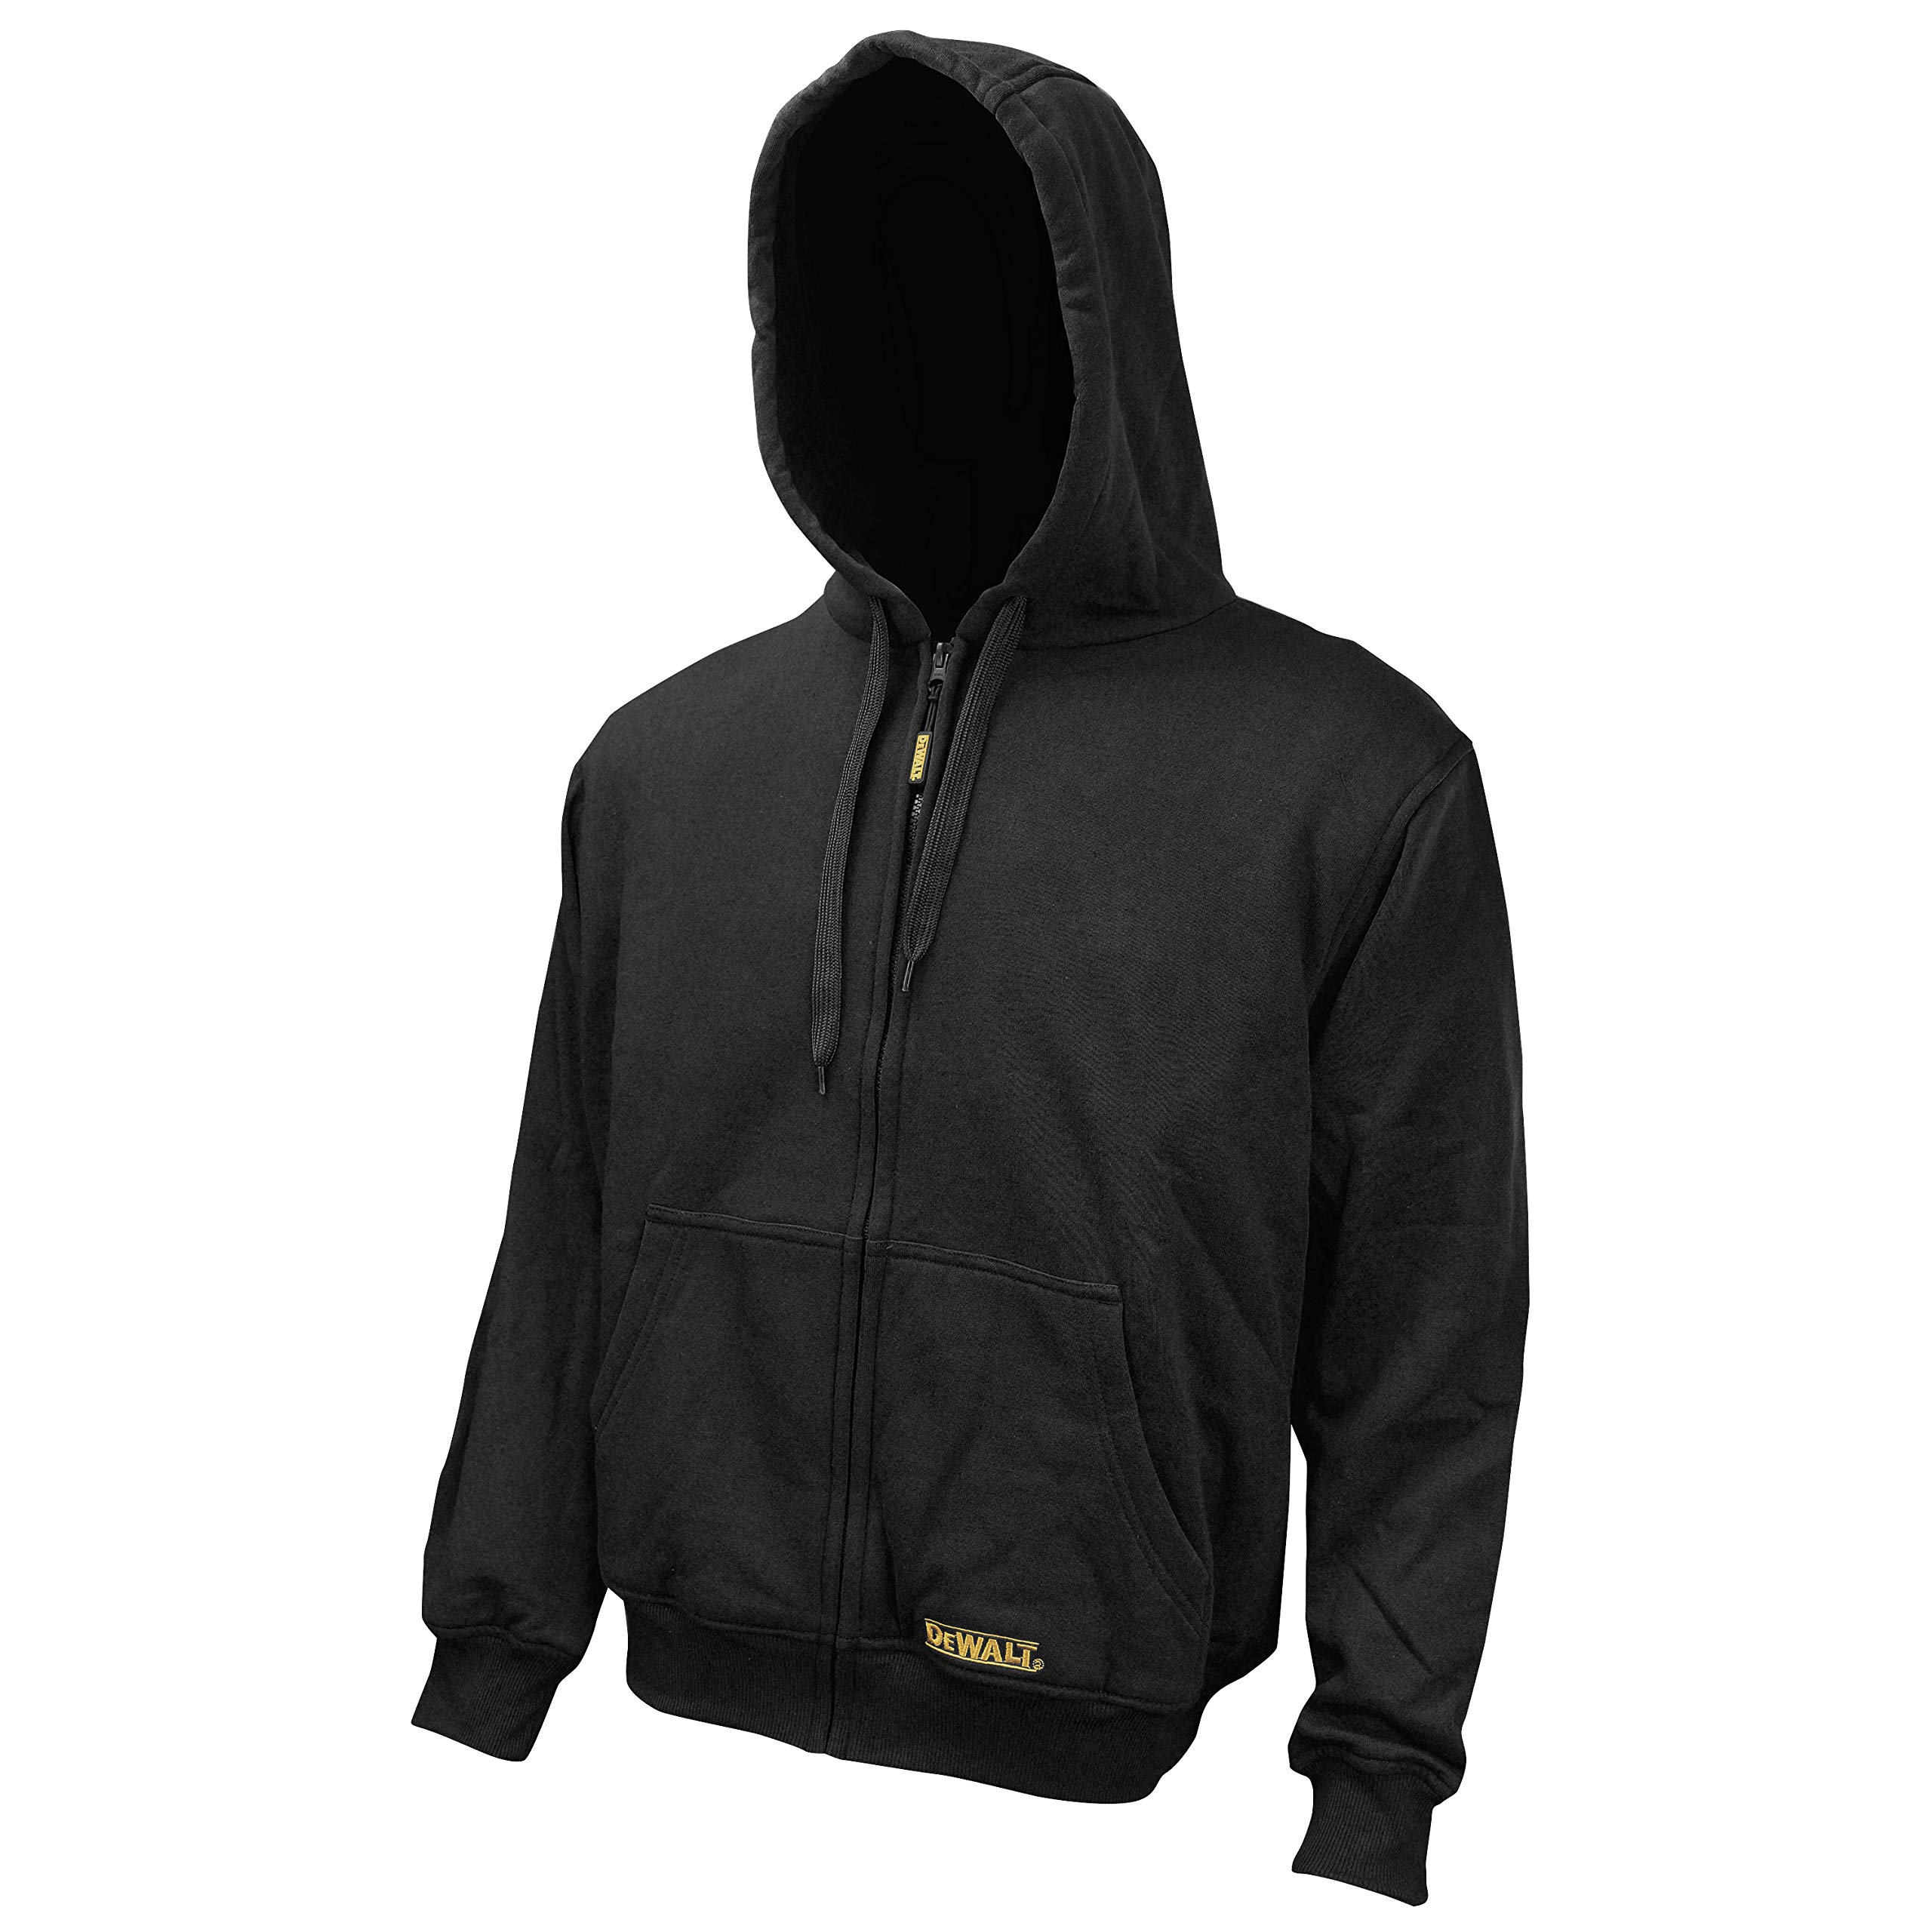 DEWALT DCHJ067B Heated Hoodie, Black, XL